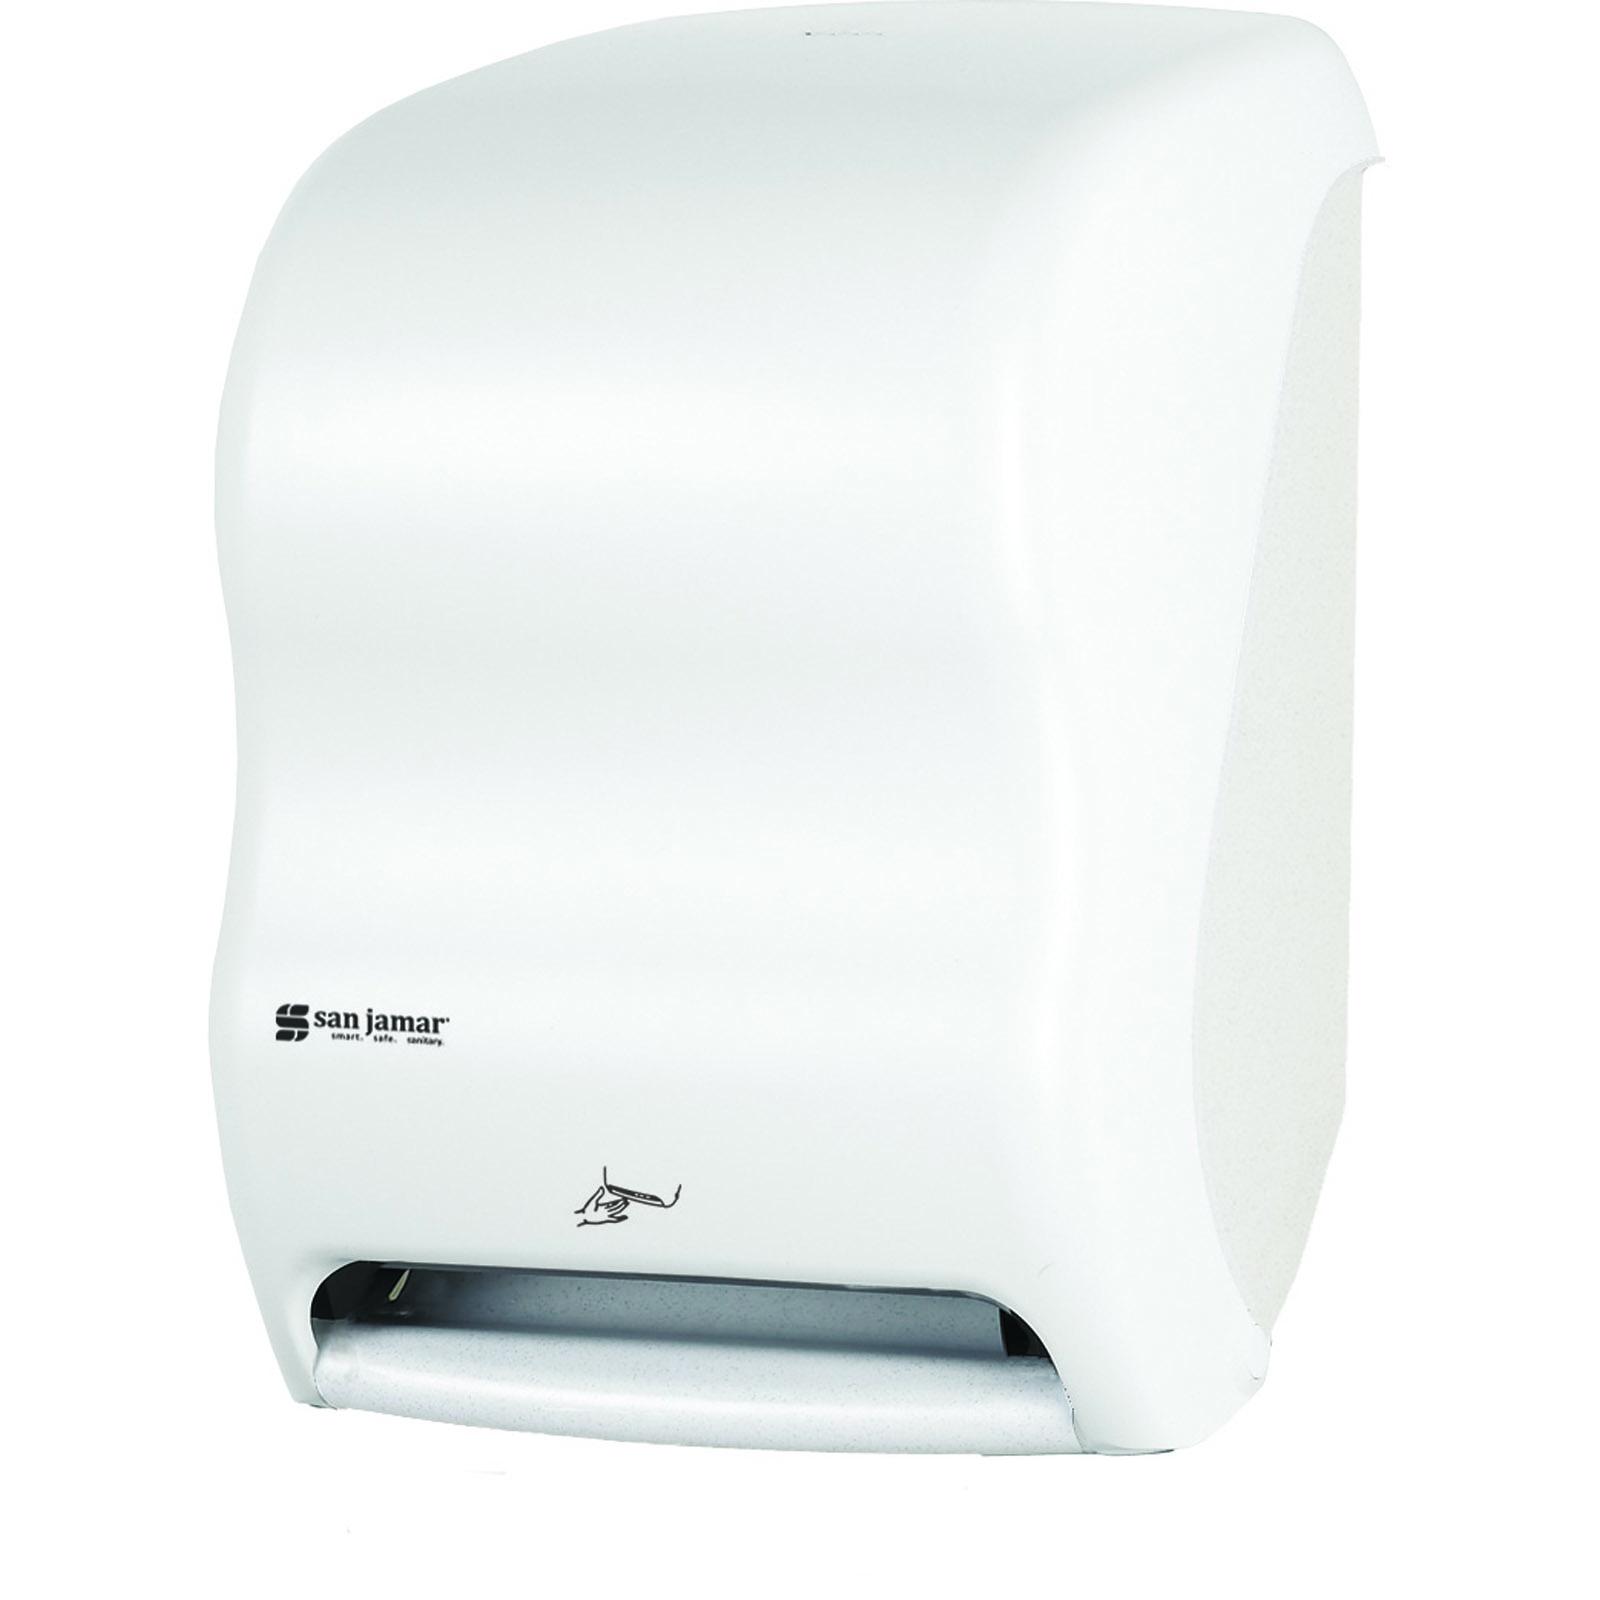 San Jamar T1400WH paper towel dispenser